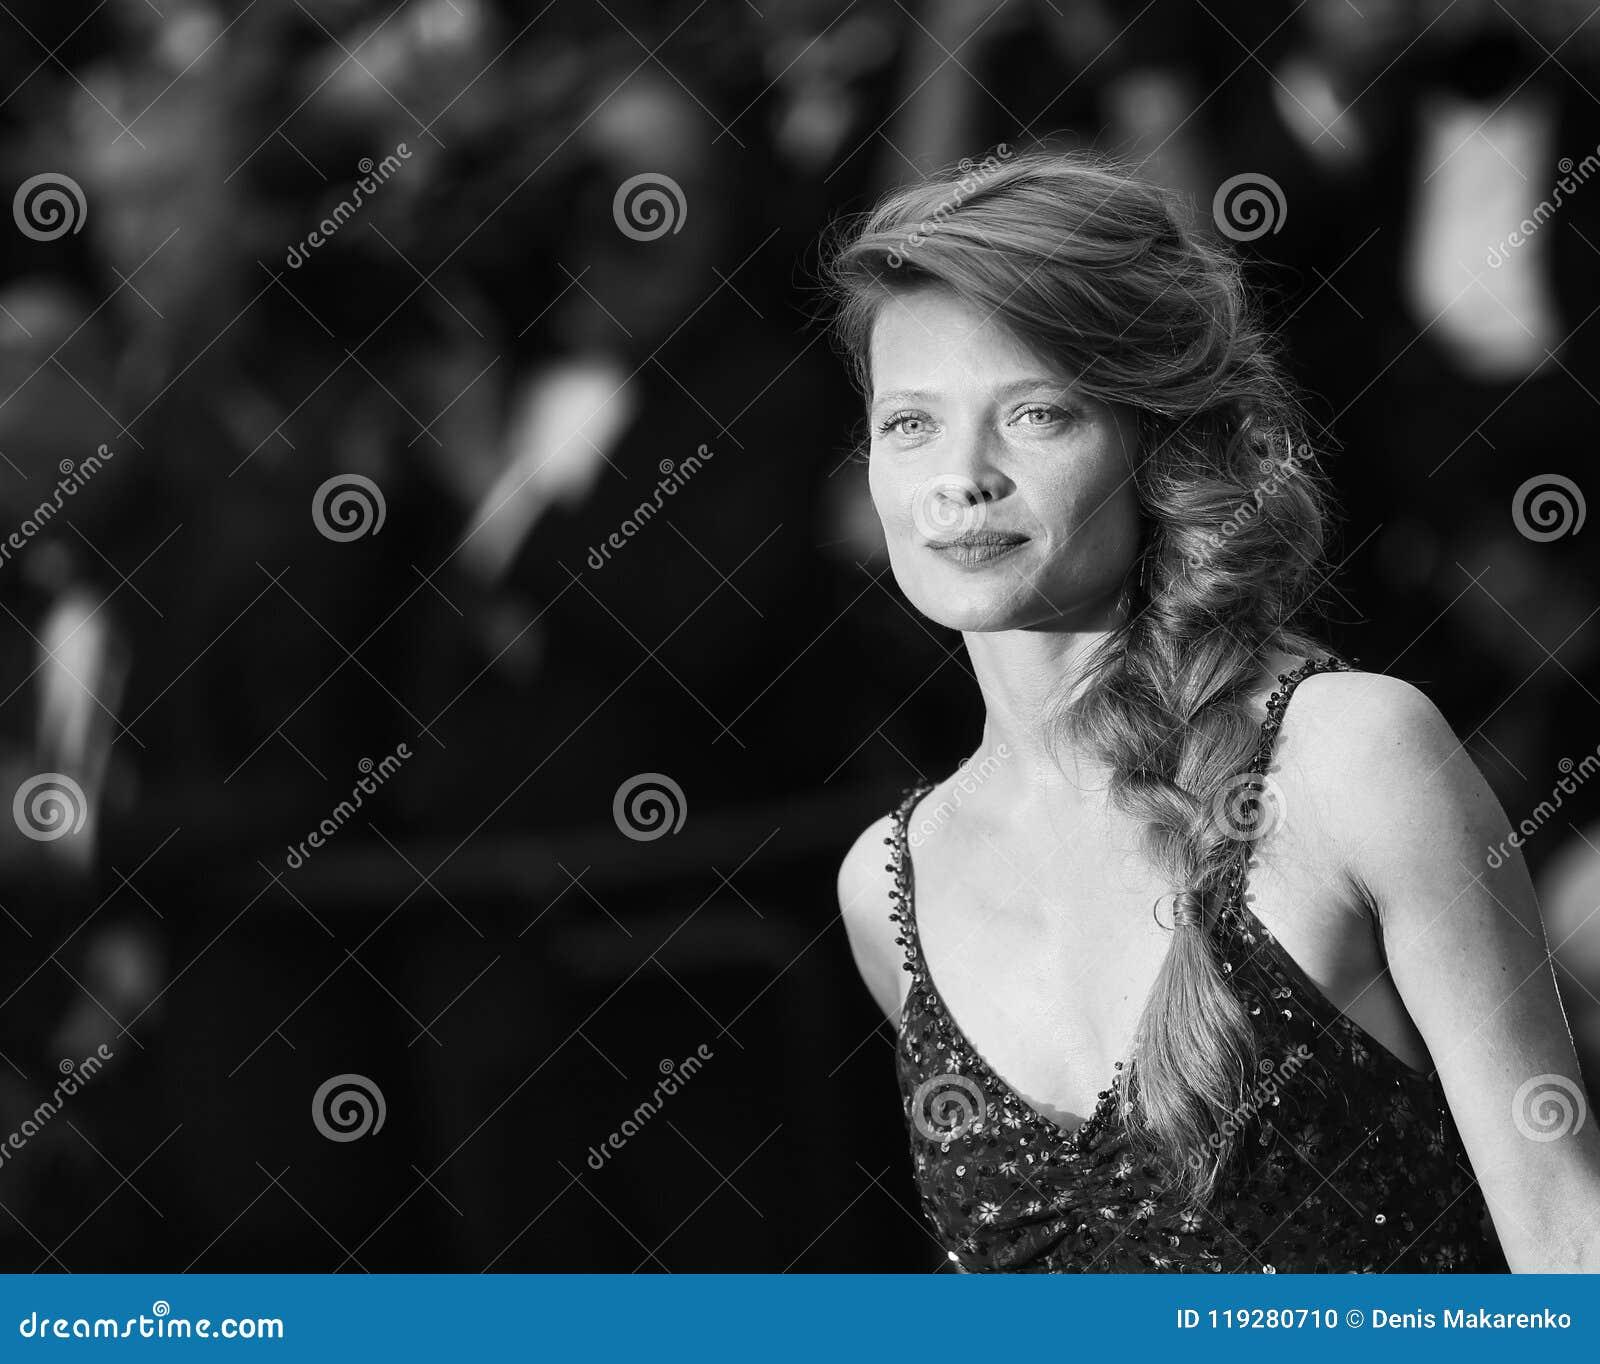 Melanie Thierry Nude Photos 4